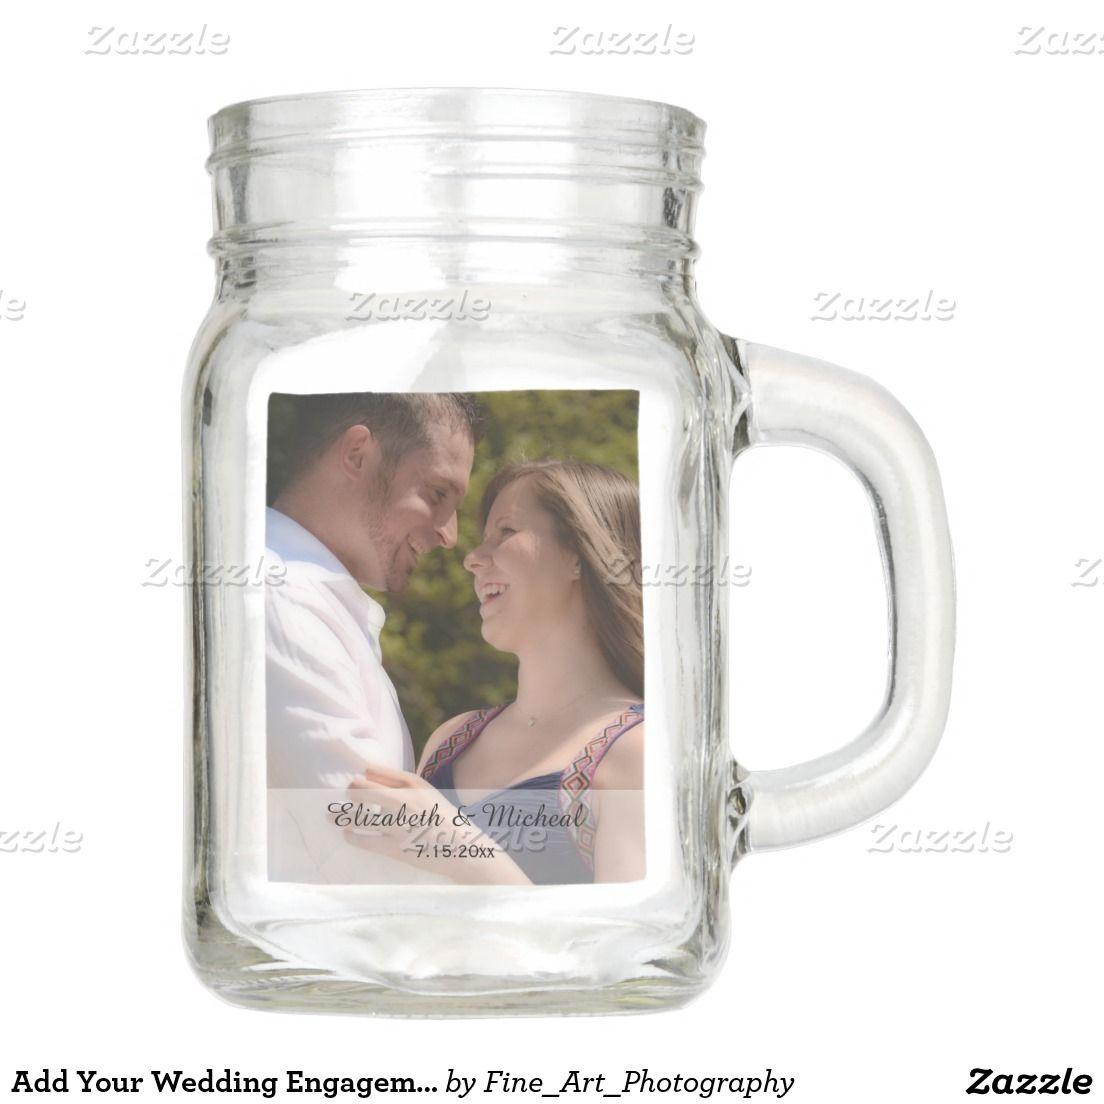 Add Your Wedding Engagement Photo Personalized Mason Jar Add your ...